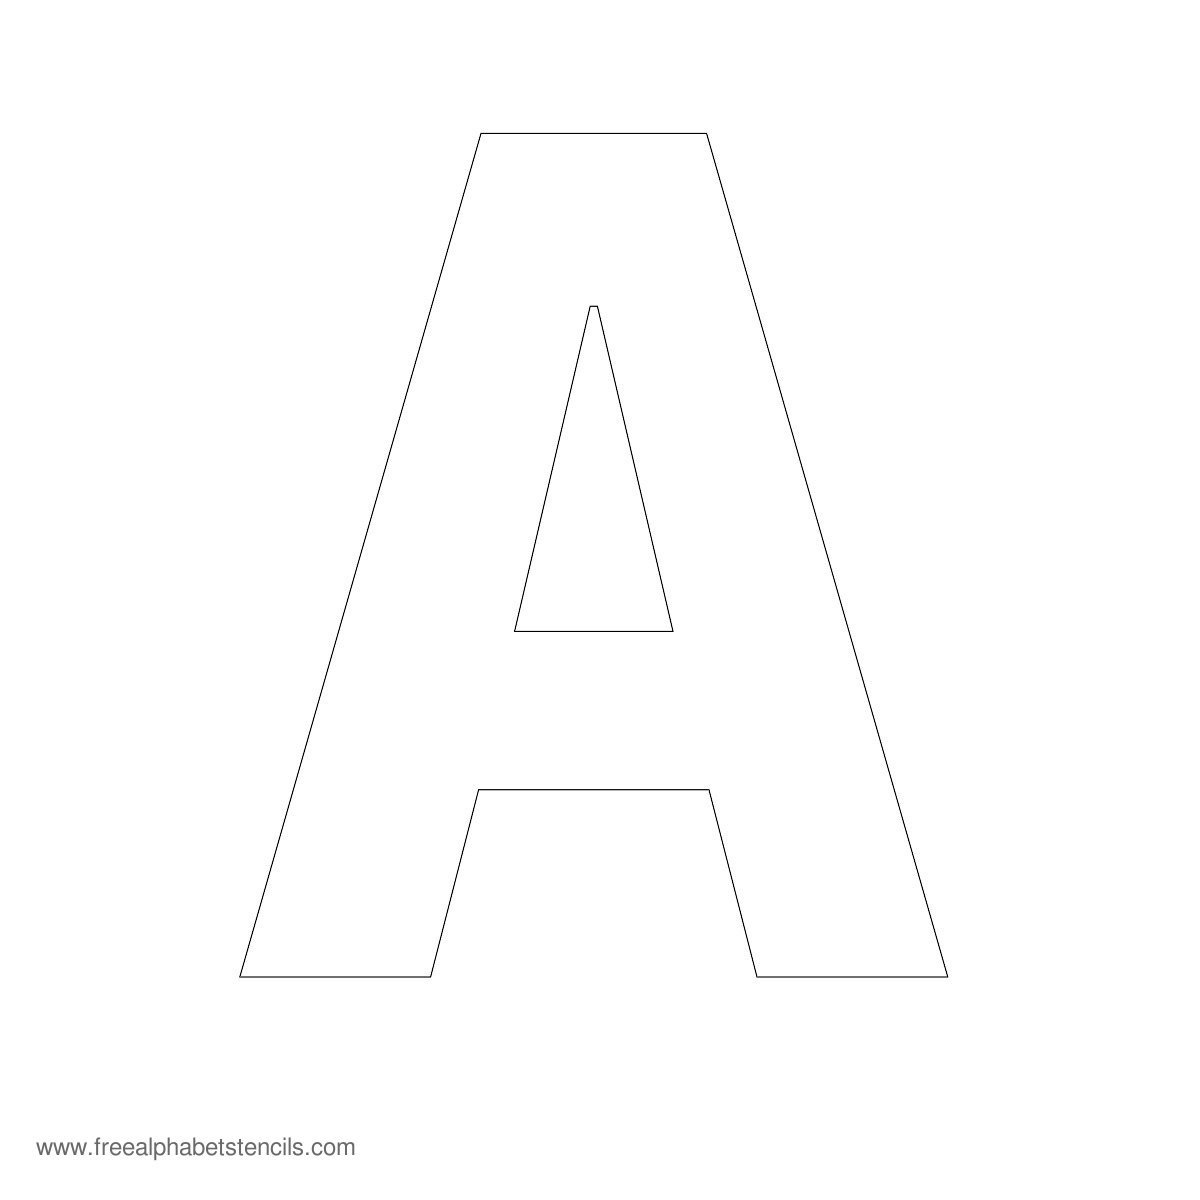 Large Alphabet Stencils   Freealphabetstencils - Free Printable Letter Stencils